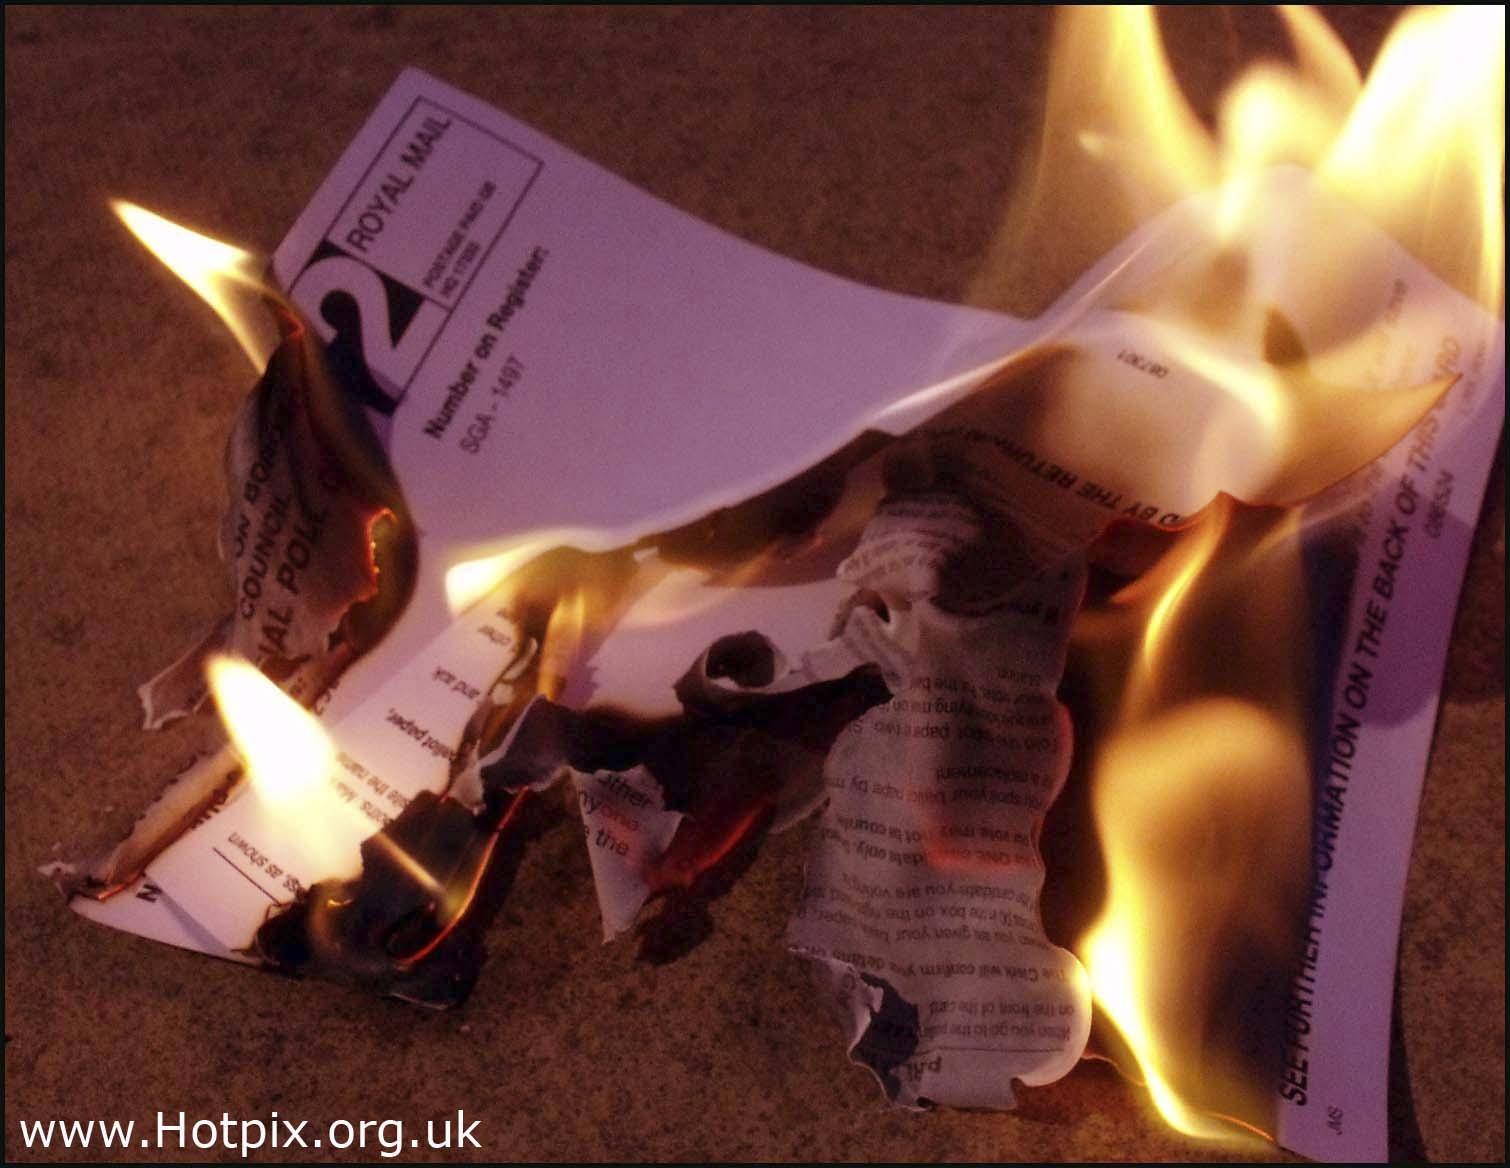 burn,burning,burnt,poll,polling,card,UK,election,2010,parliament burn,parliament,labour,tory,conservative,liberal,democrate,ukip,BNP,hot,station,register,post,postal,vote,voting,official,monster,raving,looney,warrington,BC,borough,council,cheshire,england,brit,fire,onfire,bonfire,flame,light,stream,lightstream,muchacha,femenina,de,la,mujer,se\u00f1ora,lady,female,woman,girl,\u5973\u6027\u30e1\u30b9\u306e\u5973\u6027\u306e\u5973\u306e\u5b50,\u592b\u4eba\u5973\u6027\u5987\u5973\u5973\u5b69,fille,f\u00e9minine,femme,dame,hotpix!